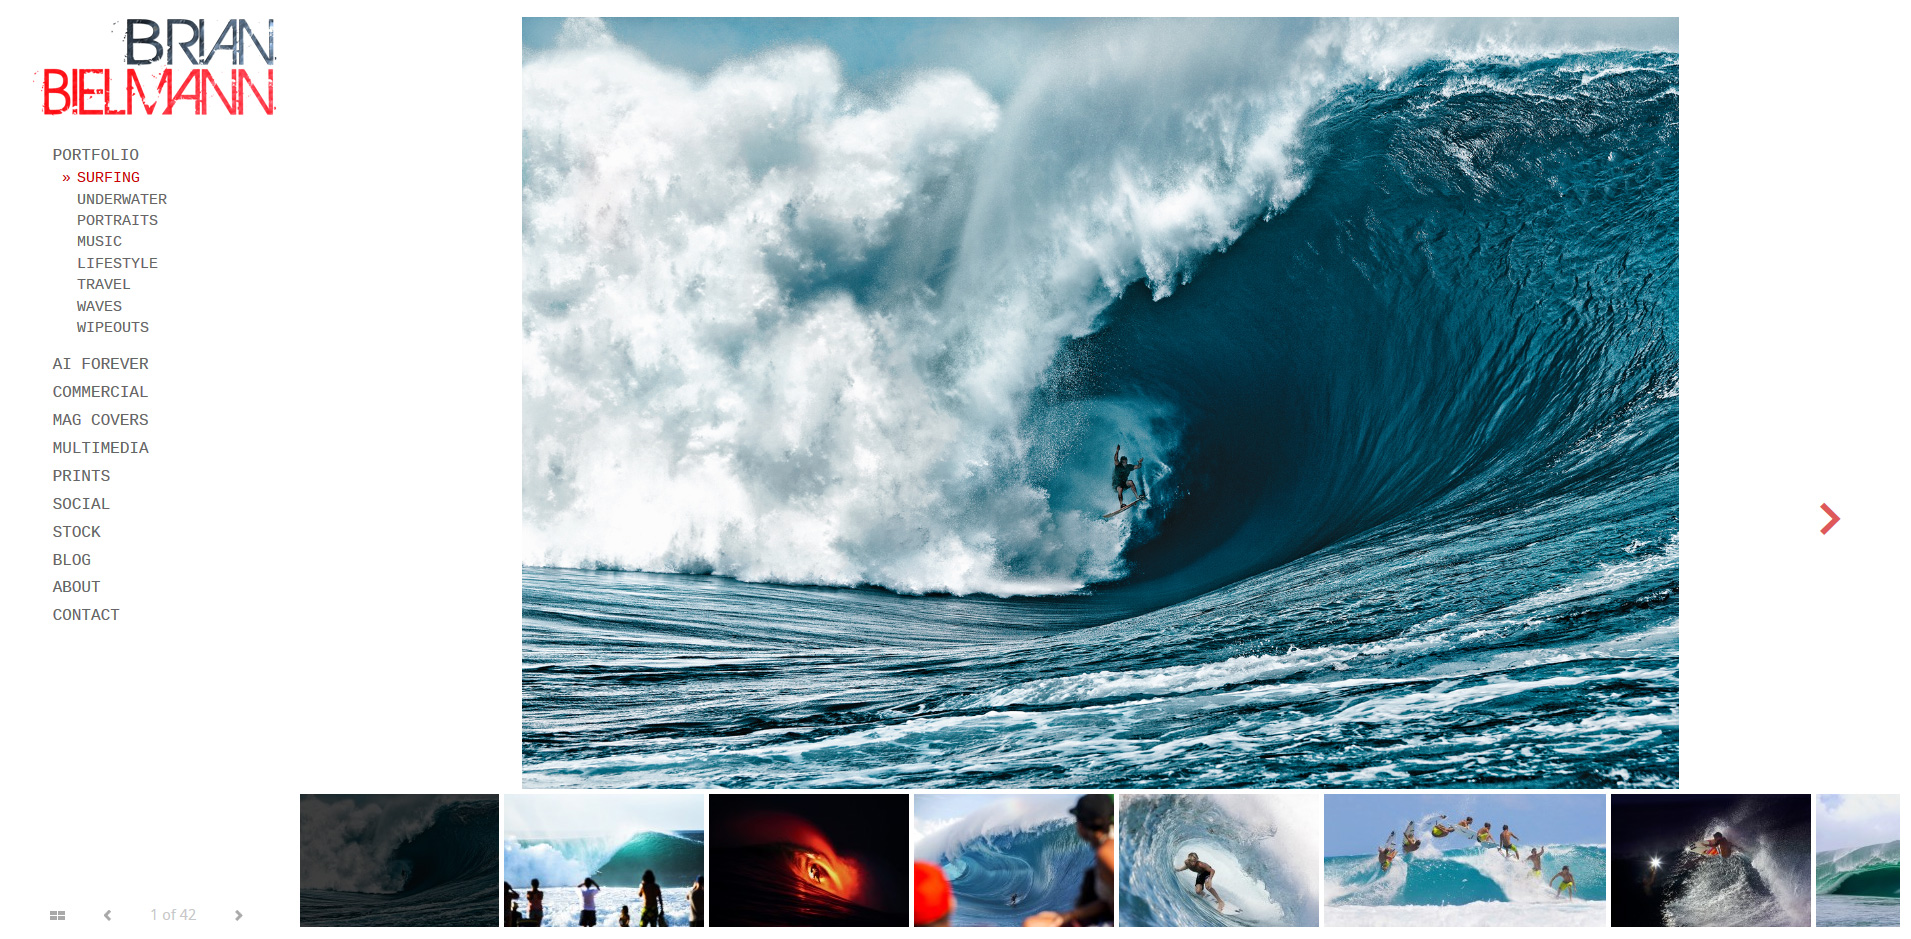 Brian Bielman's new website, featuring a photo of Nathan Fletcher at Teahupoo